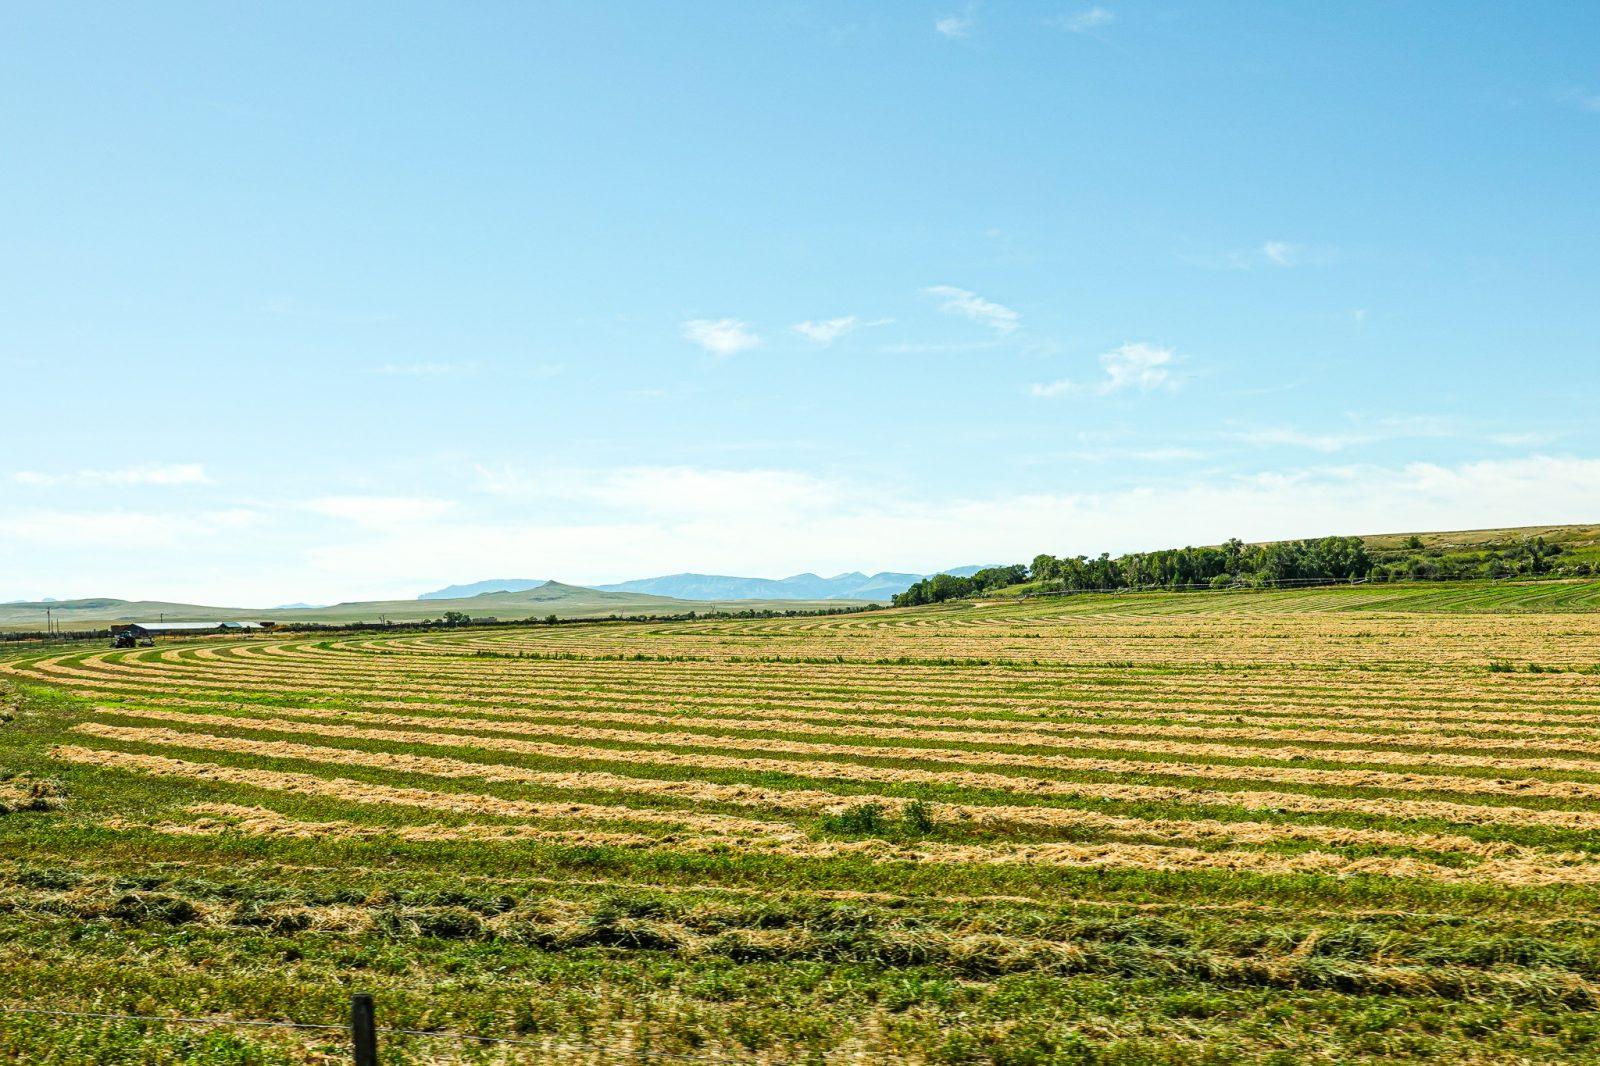 landbruk i usa